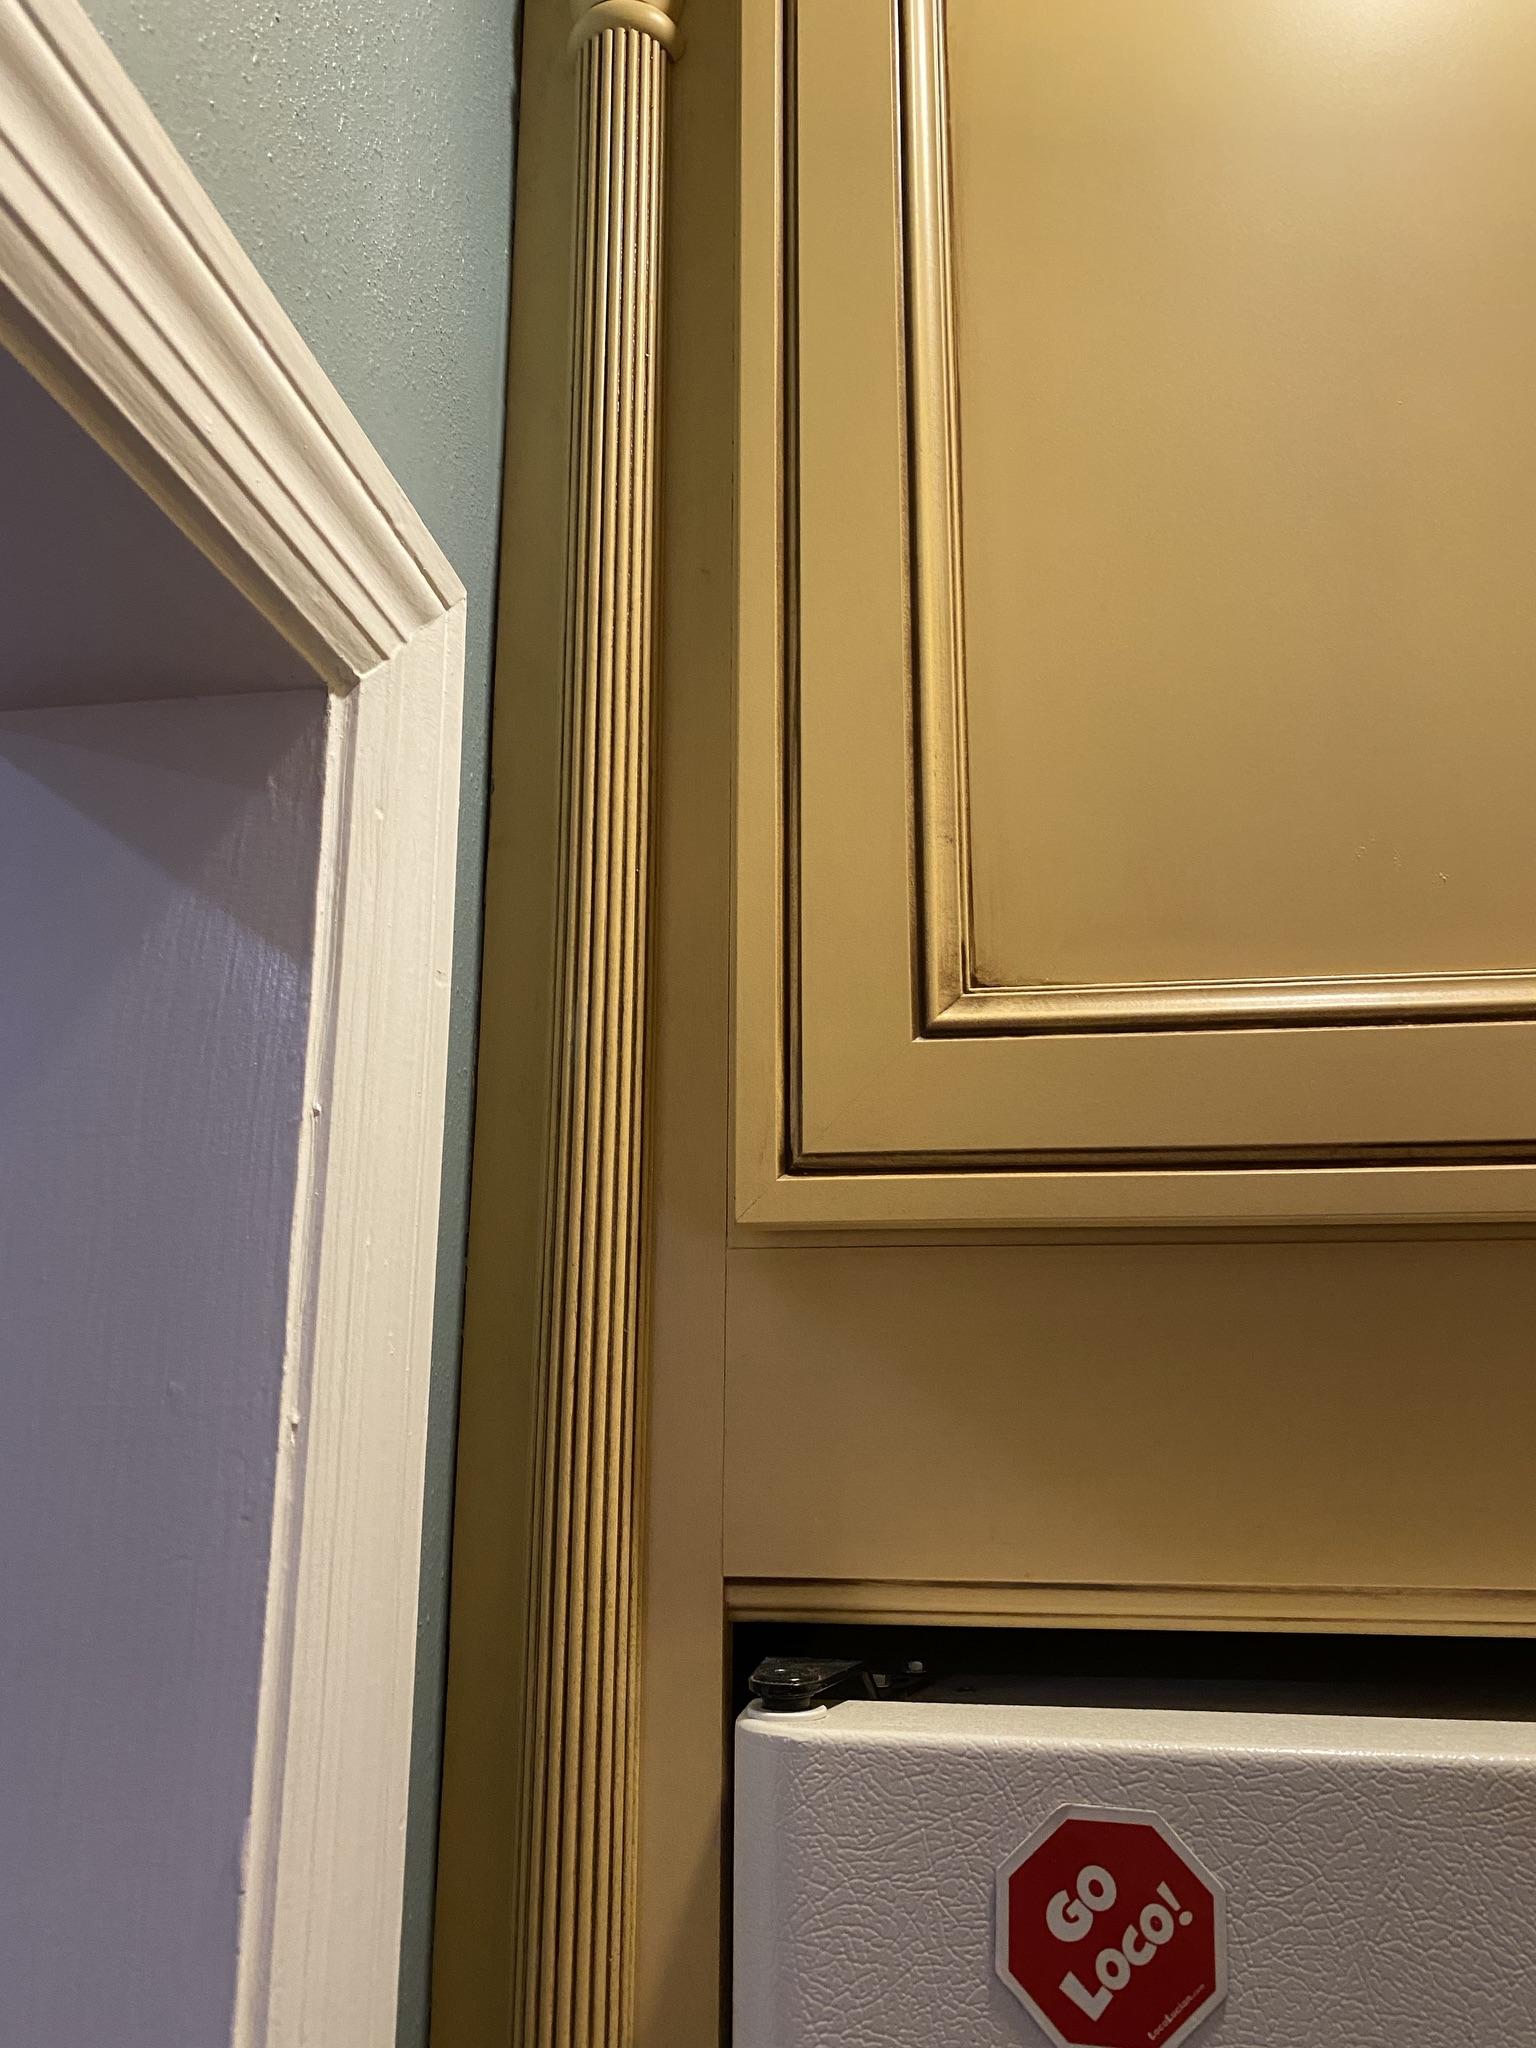 Modifying custom cabinetry-img_3.jpg